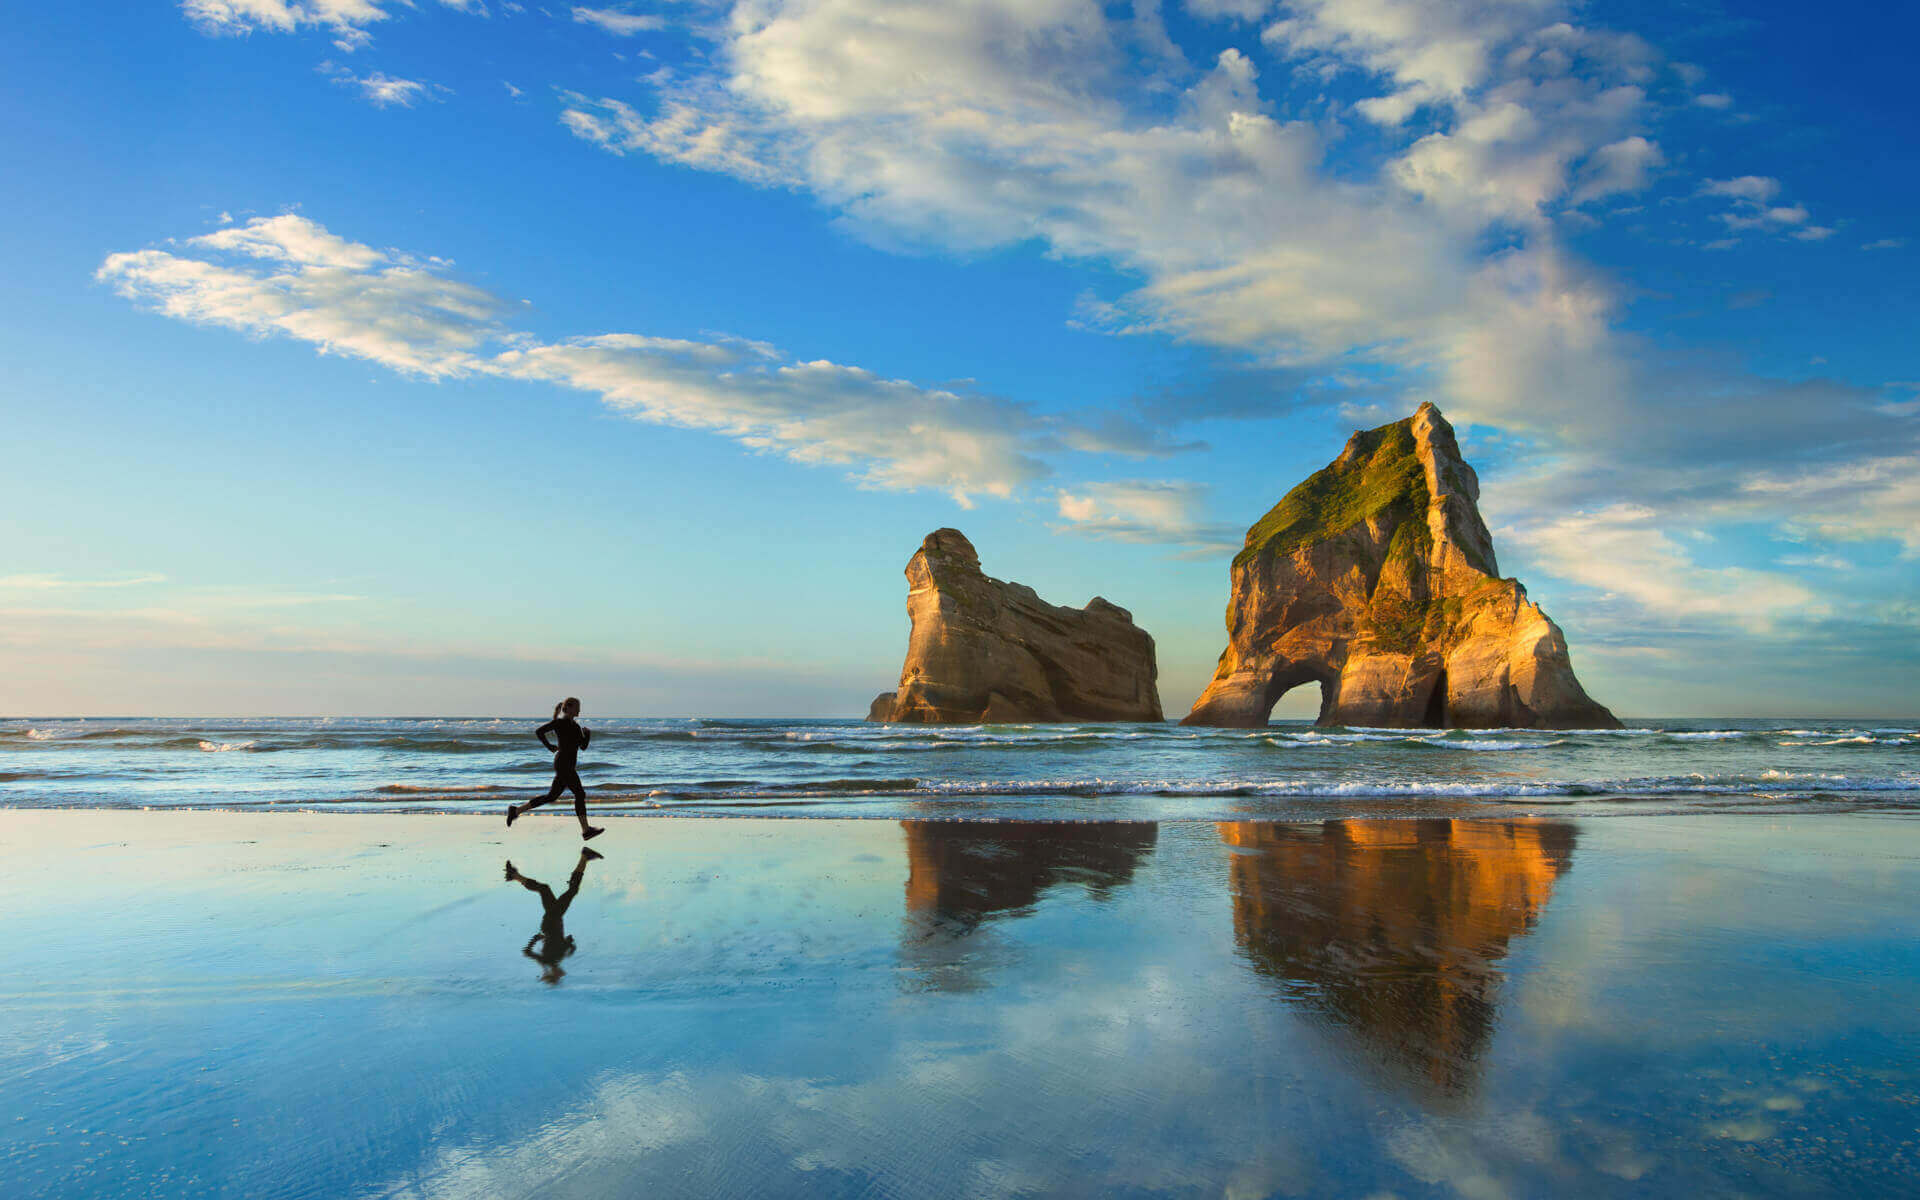 Windows 10 Wallpaper Archway Islands Wharariki Beach Golden Bay New Zealand